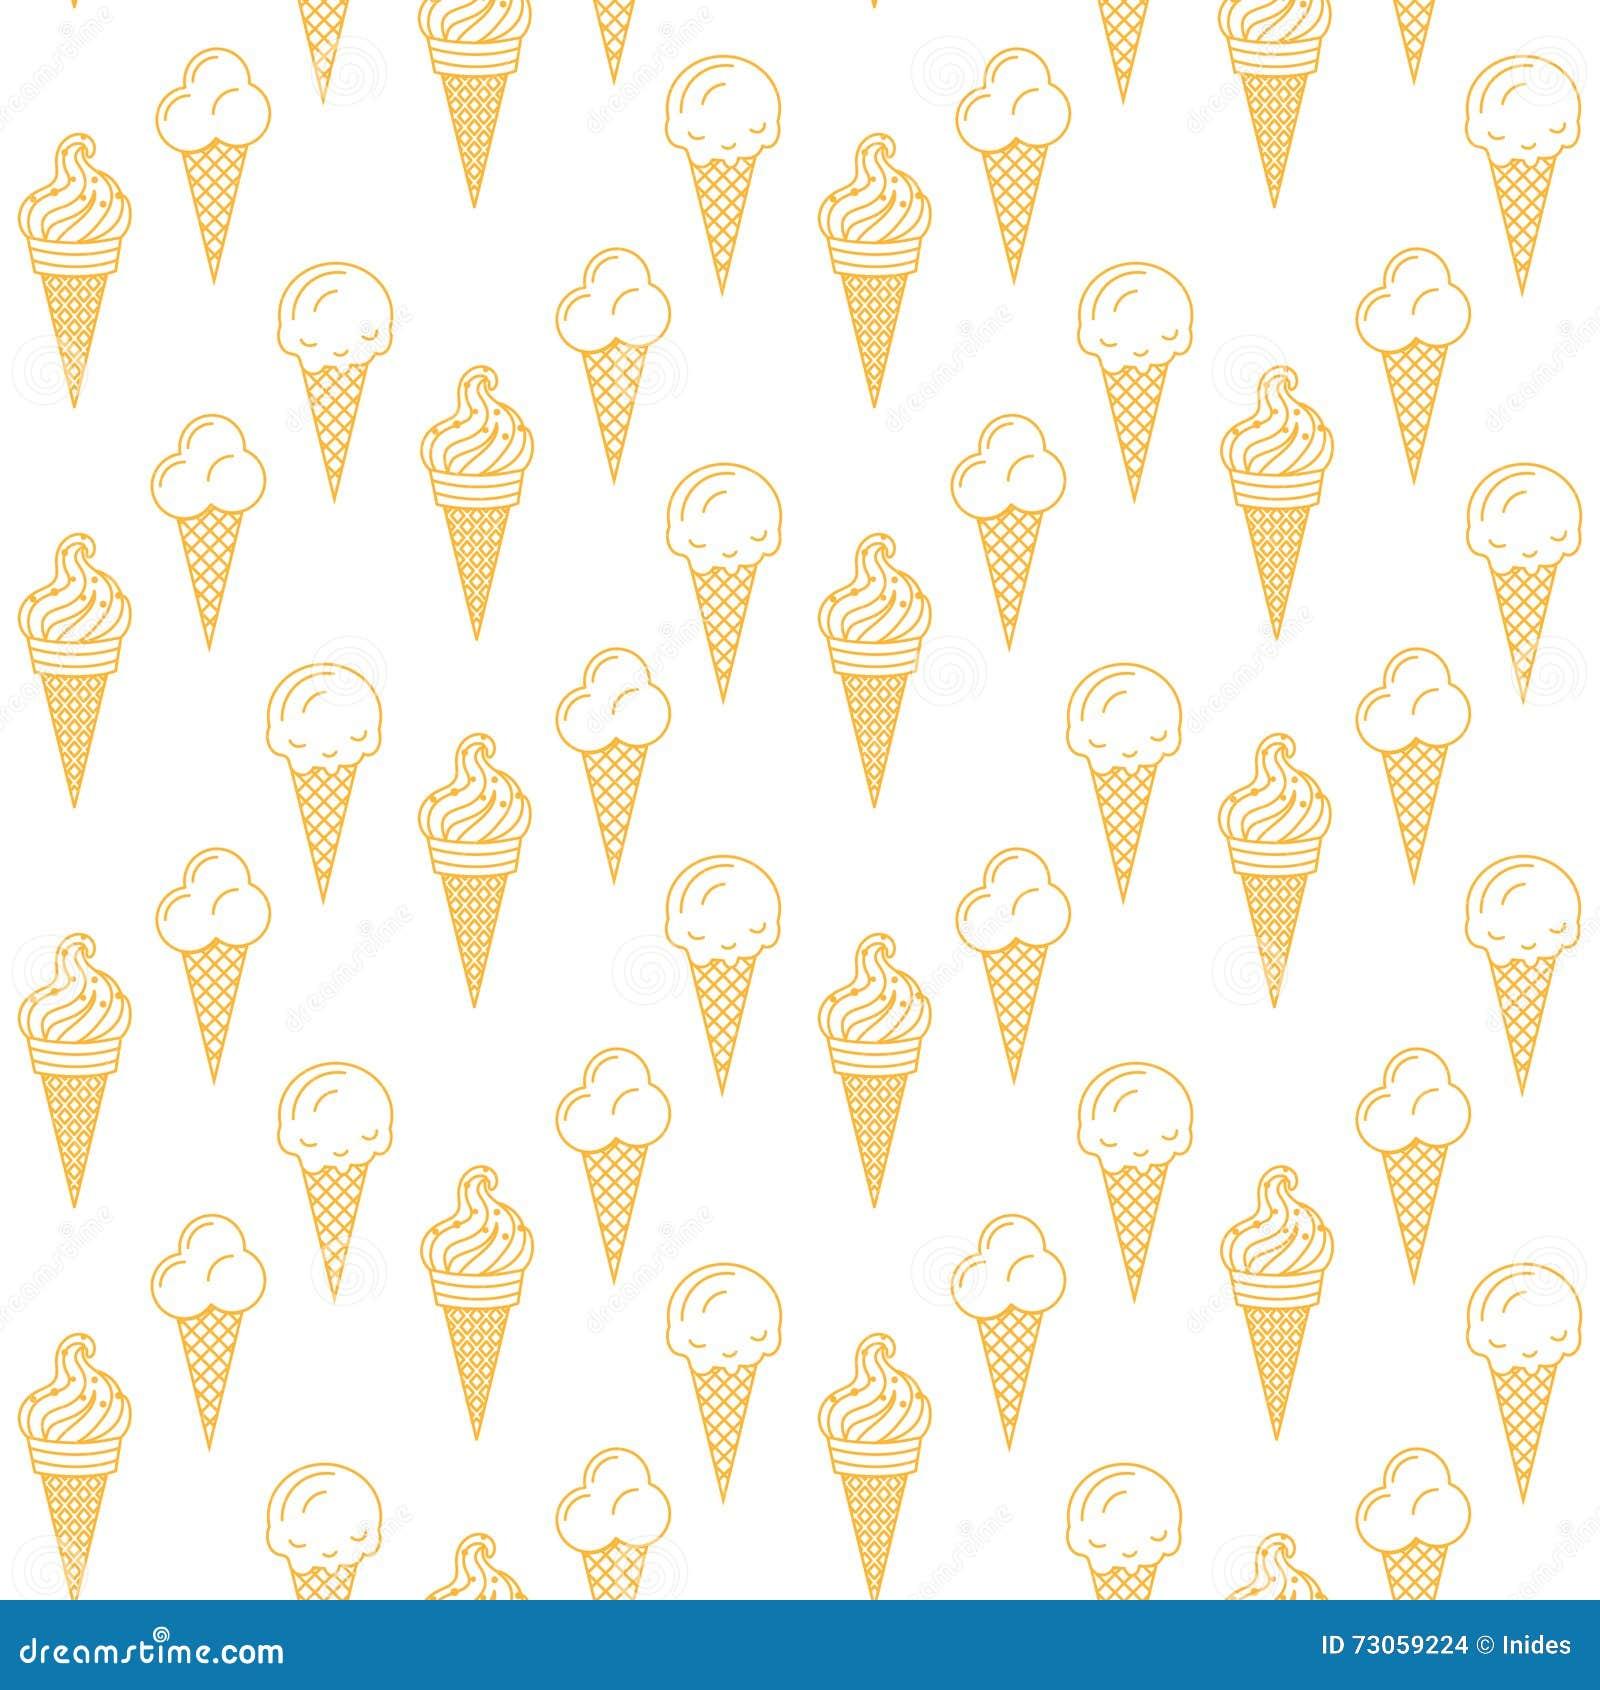 Ice Cream Cones Seamless Pattern Background Stock Vector: Orange Ice Cream Vector Seamless Pattern. Summer